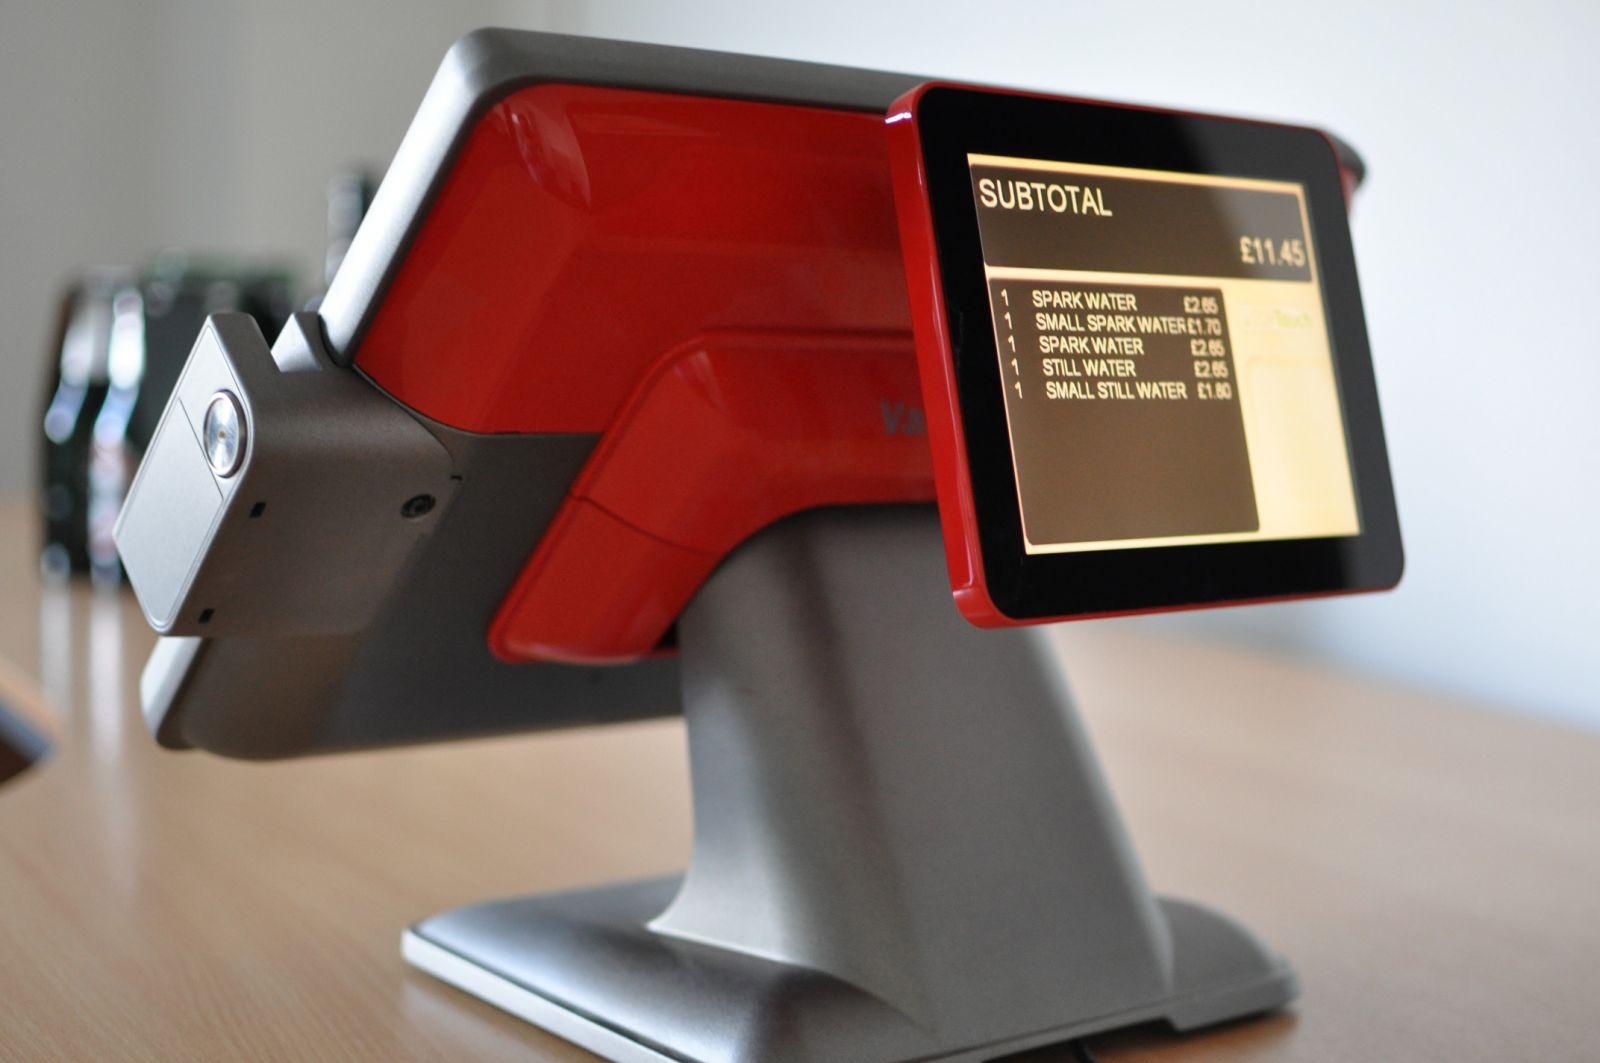 Poindus VariPos 715 - featuring the VGA Customer Display